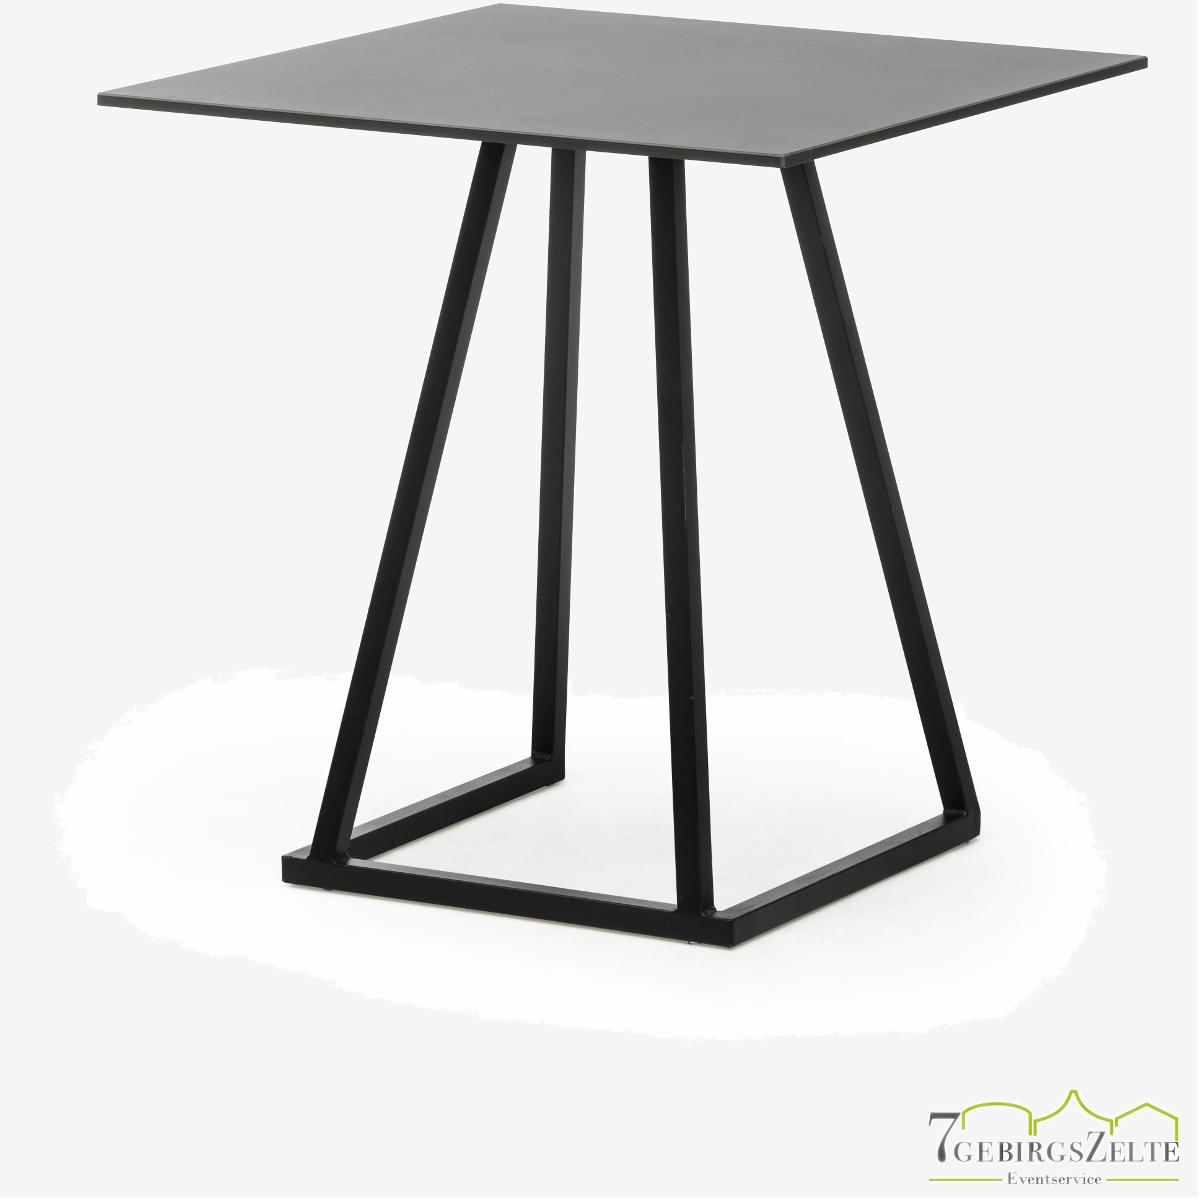 Linéa Dinner 70x70x74 - alu schwarz  - Tischplatte Farbe: variabel